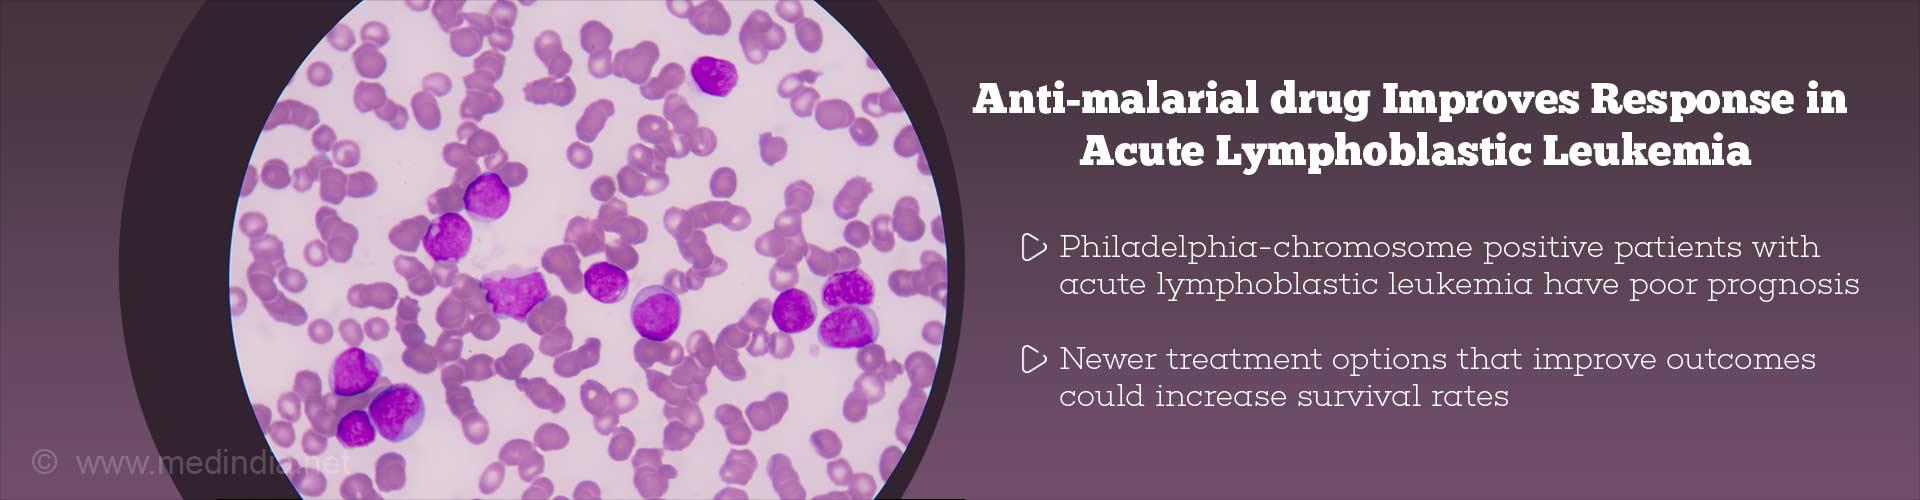 New Drug Combination Shows Promise in Acute Lymphoblastic Leukemia